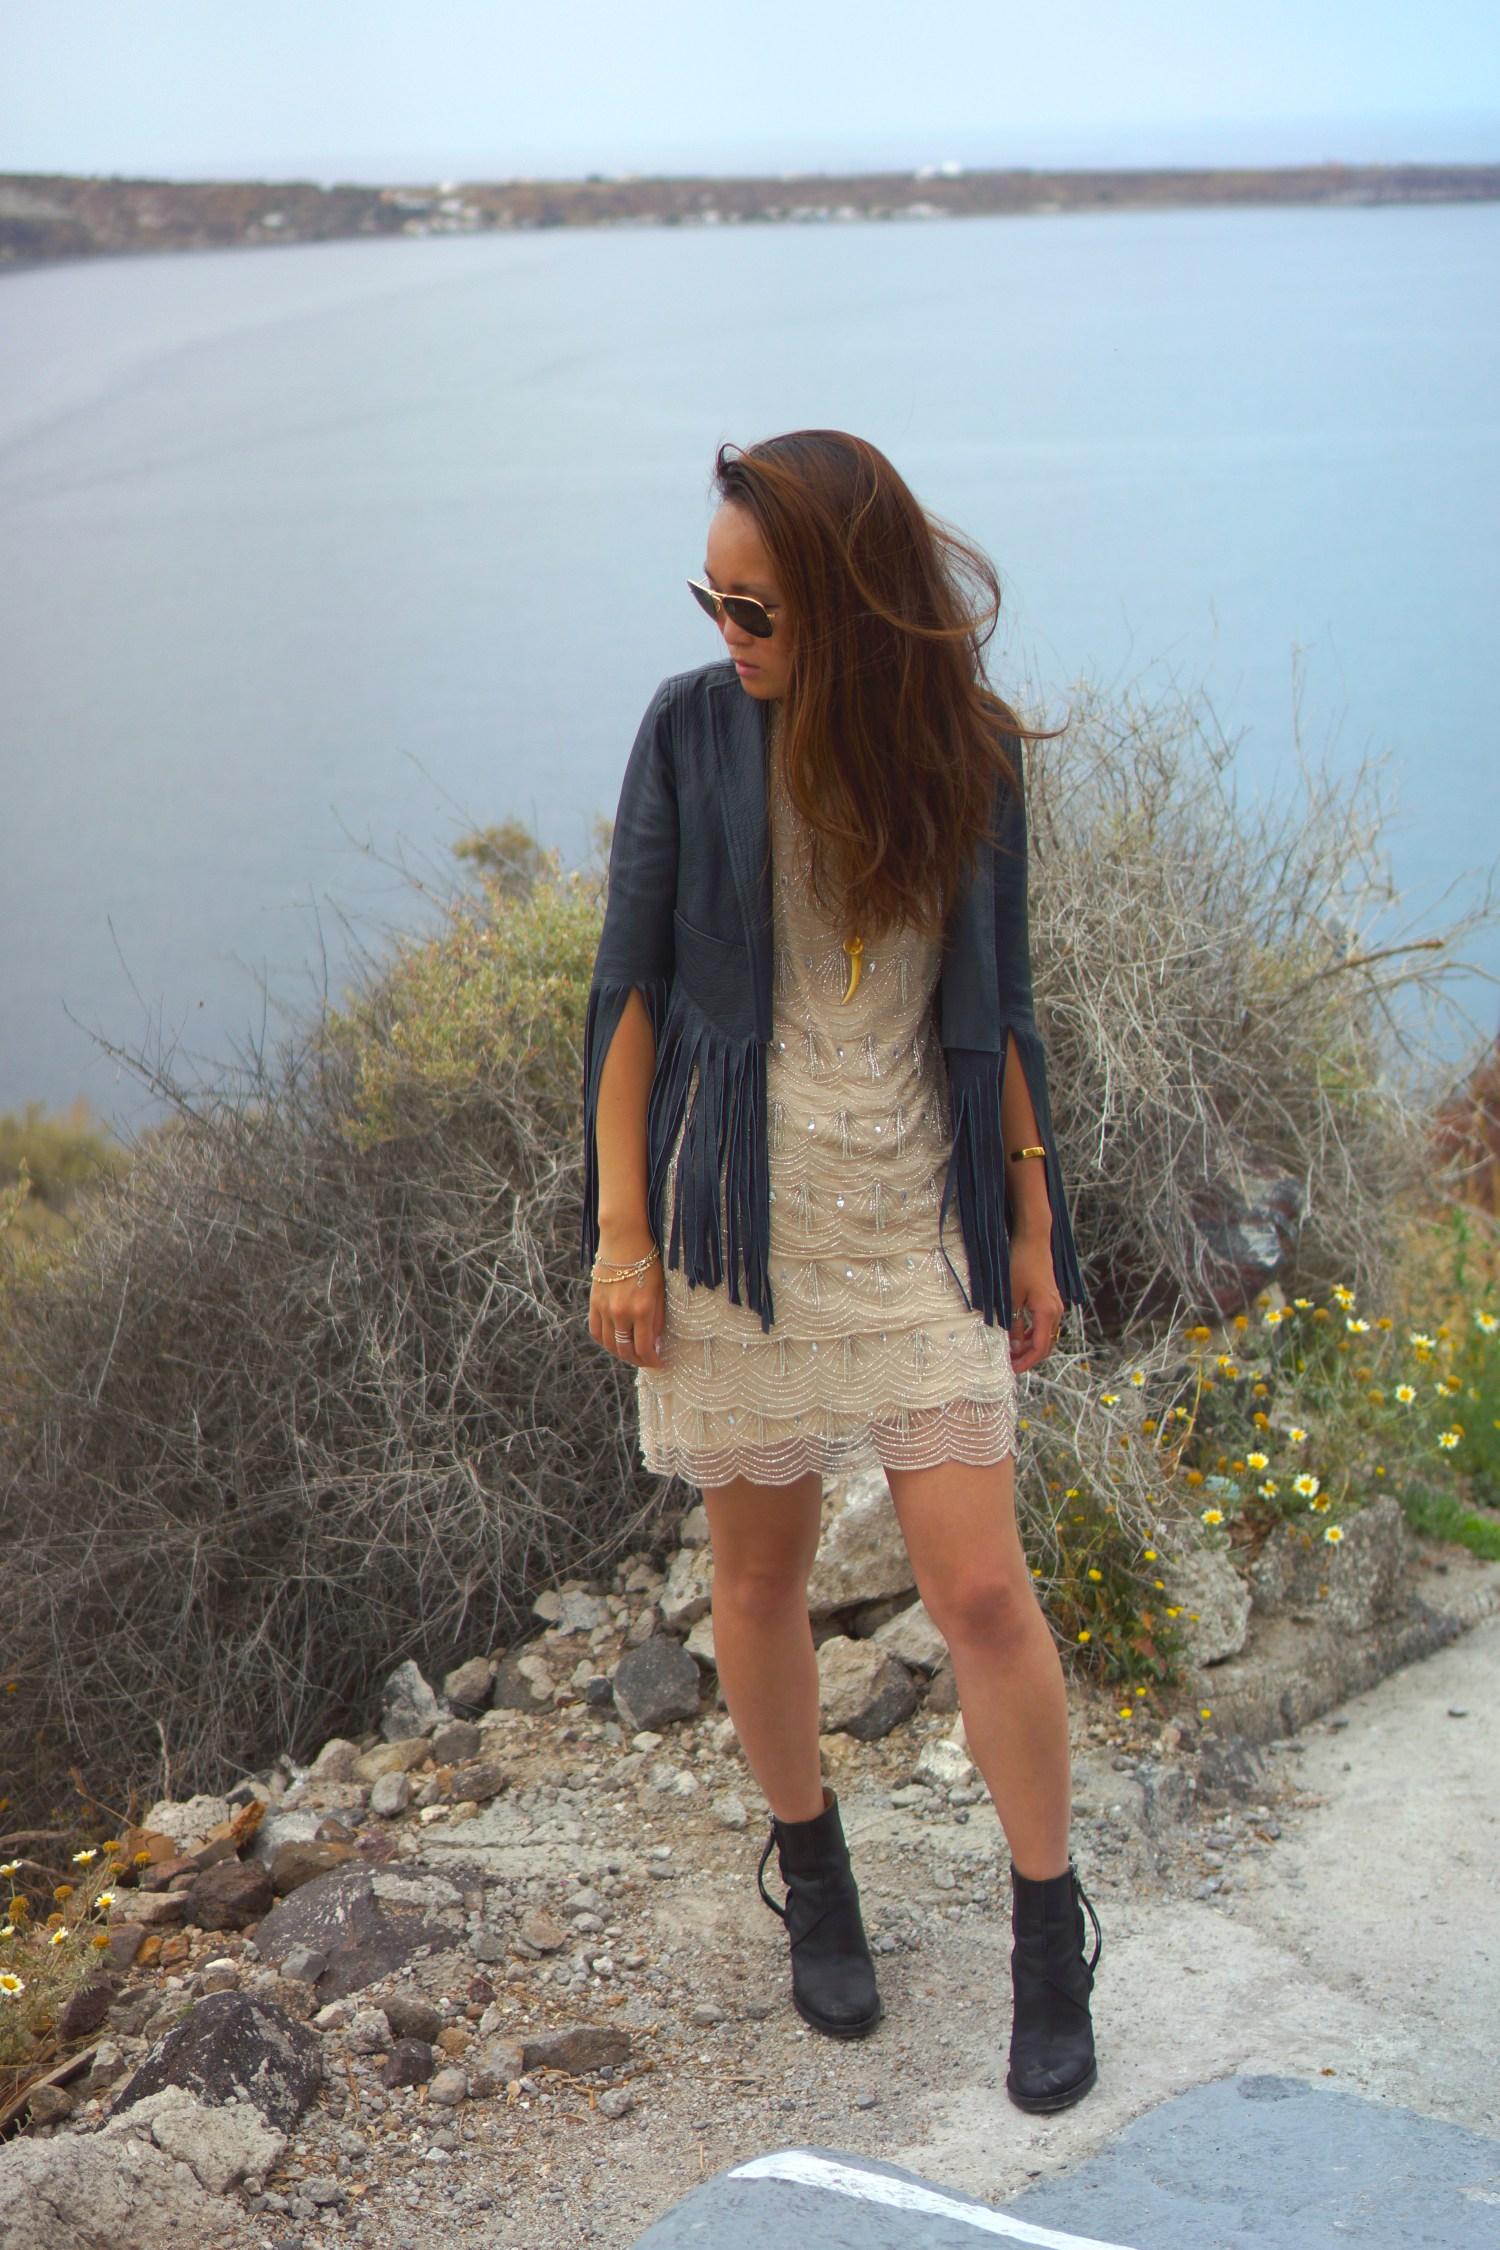 mariko kuo in kate moss for topshop jacket in santorini greece